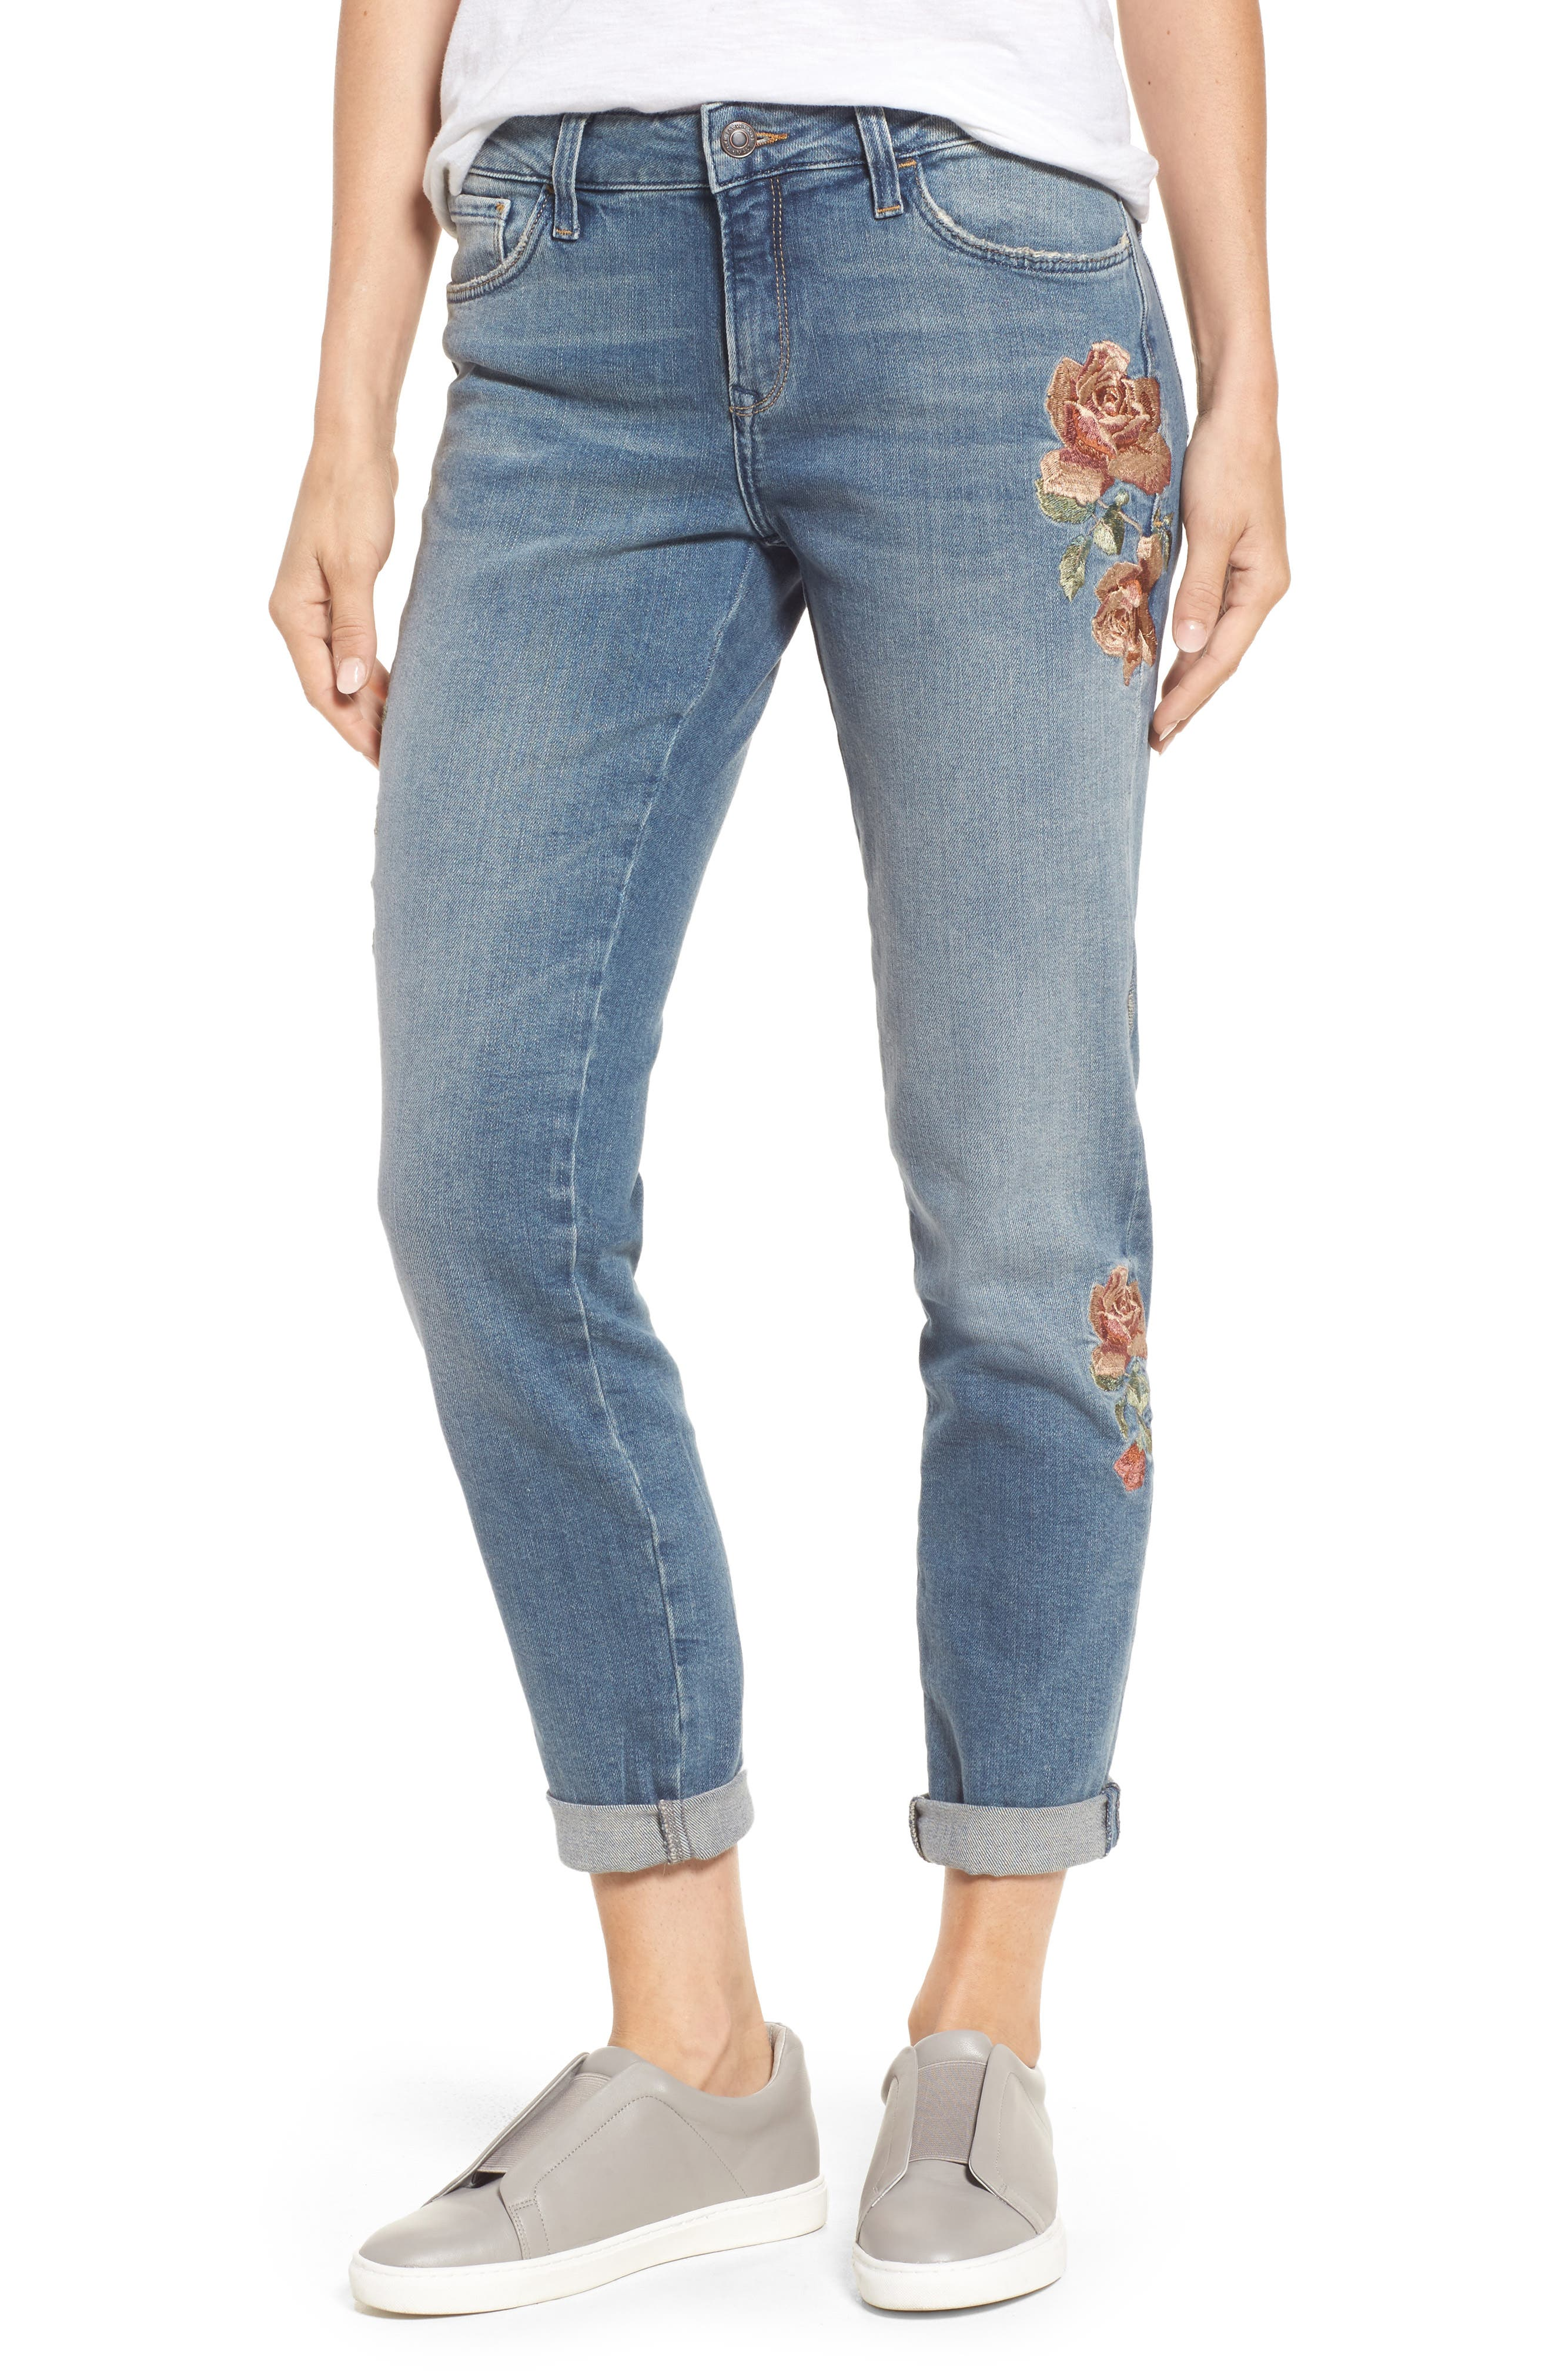 Ada Embroidered Boyfriend Jeans,                         Main,                         color,